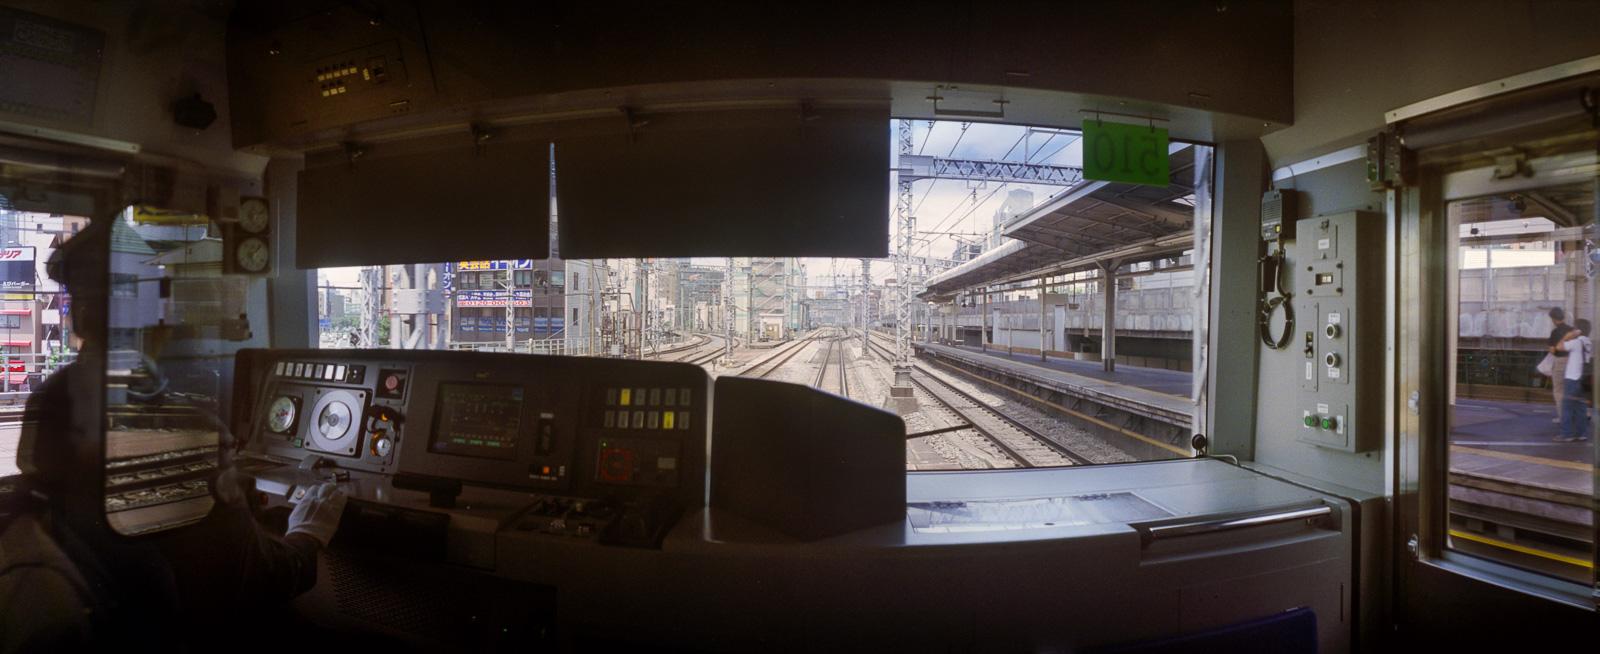 22-train-to-akihabara.jpg